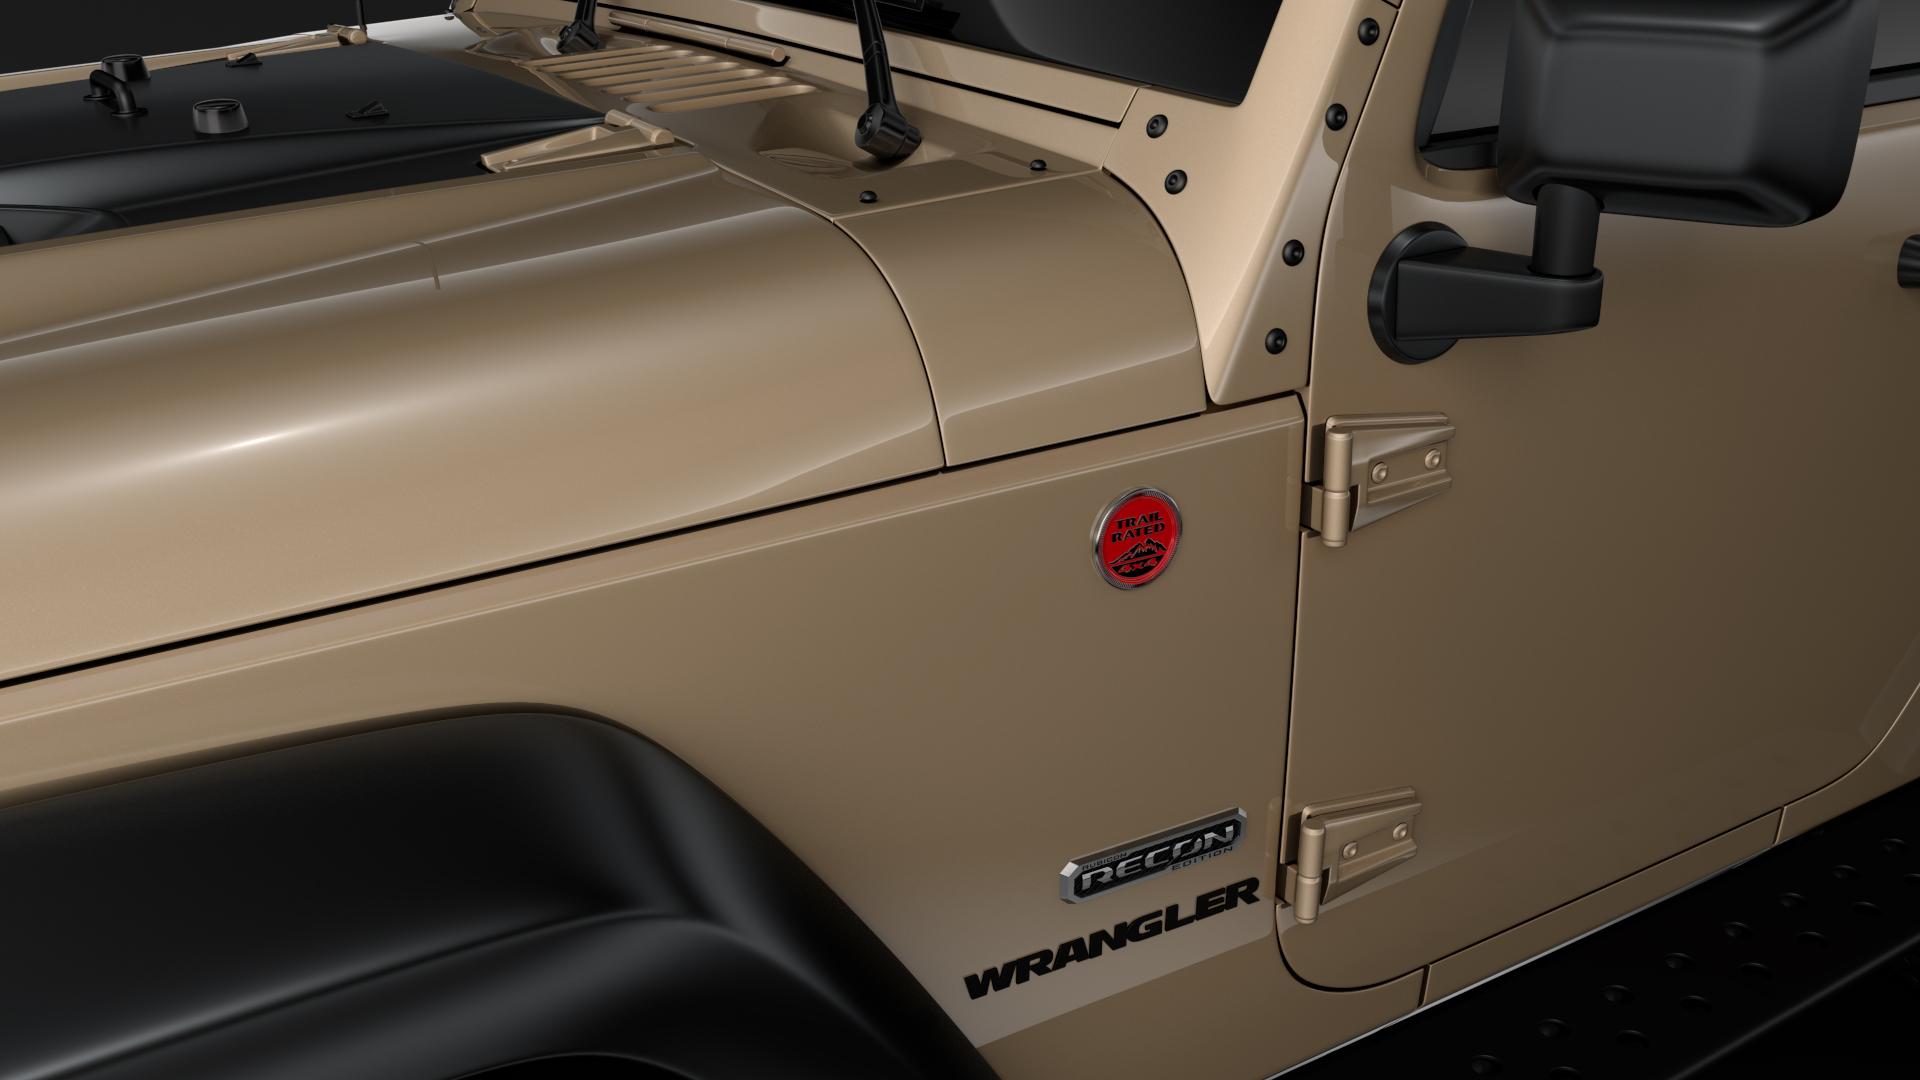 jeep wrangler rubicon recon jk 2017 3d model max fbx lwo ma mb hrc xsi obj 276950